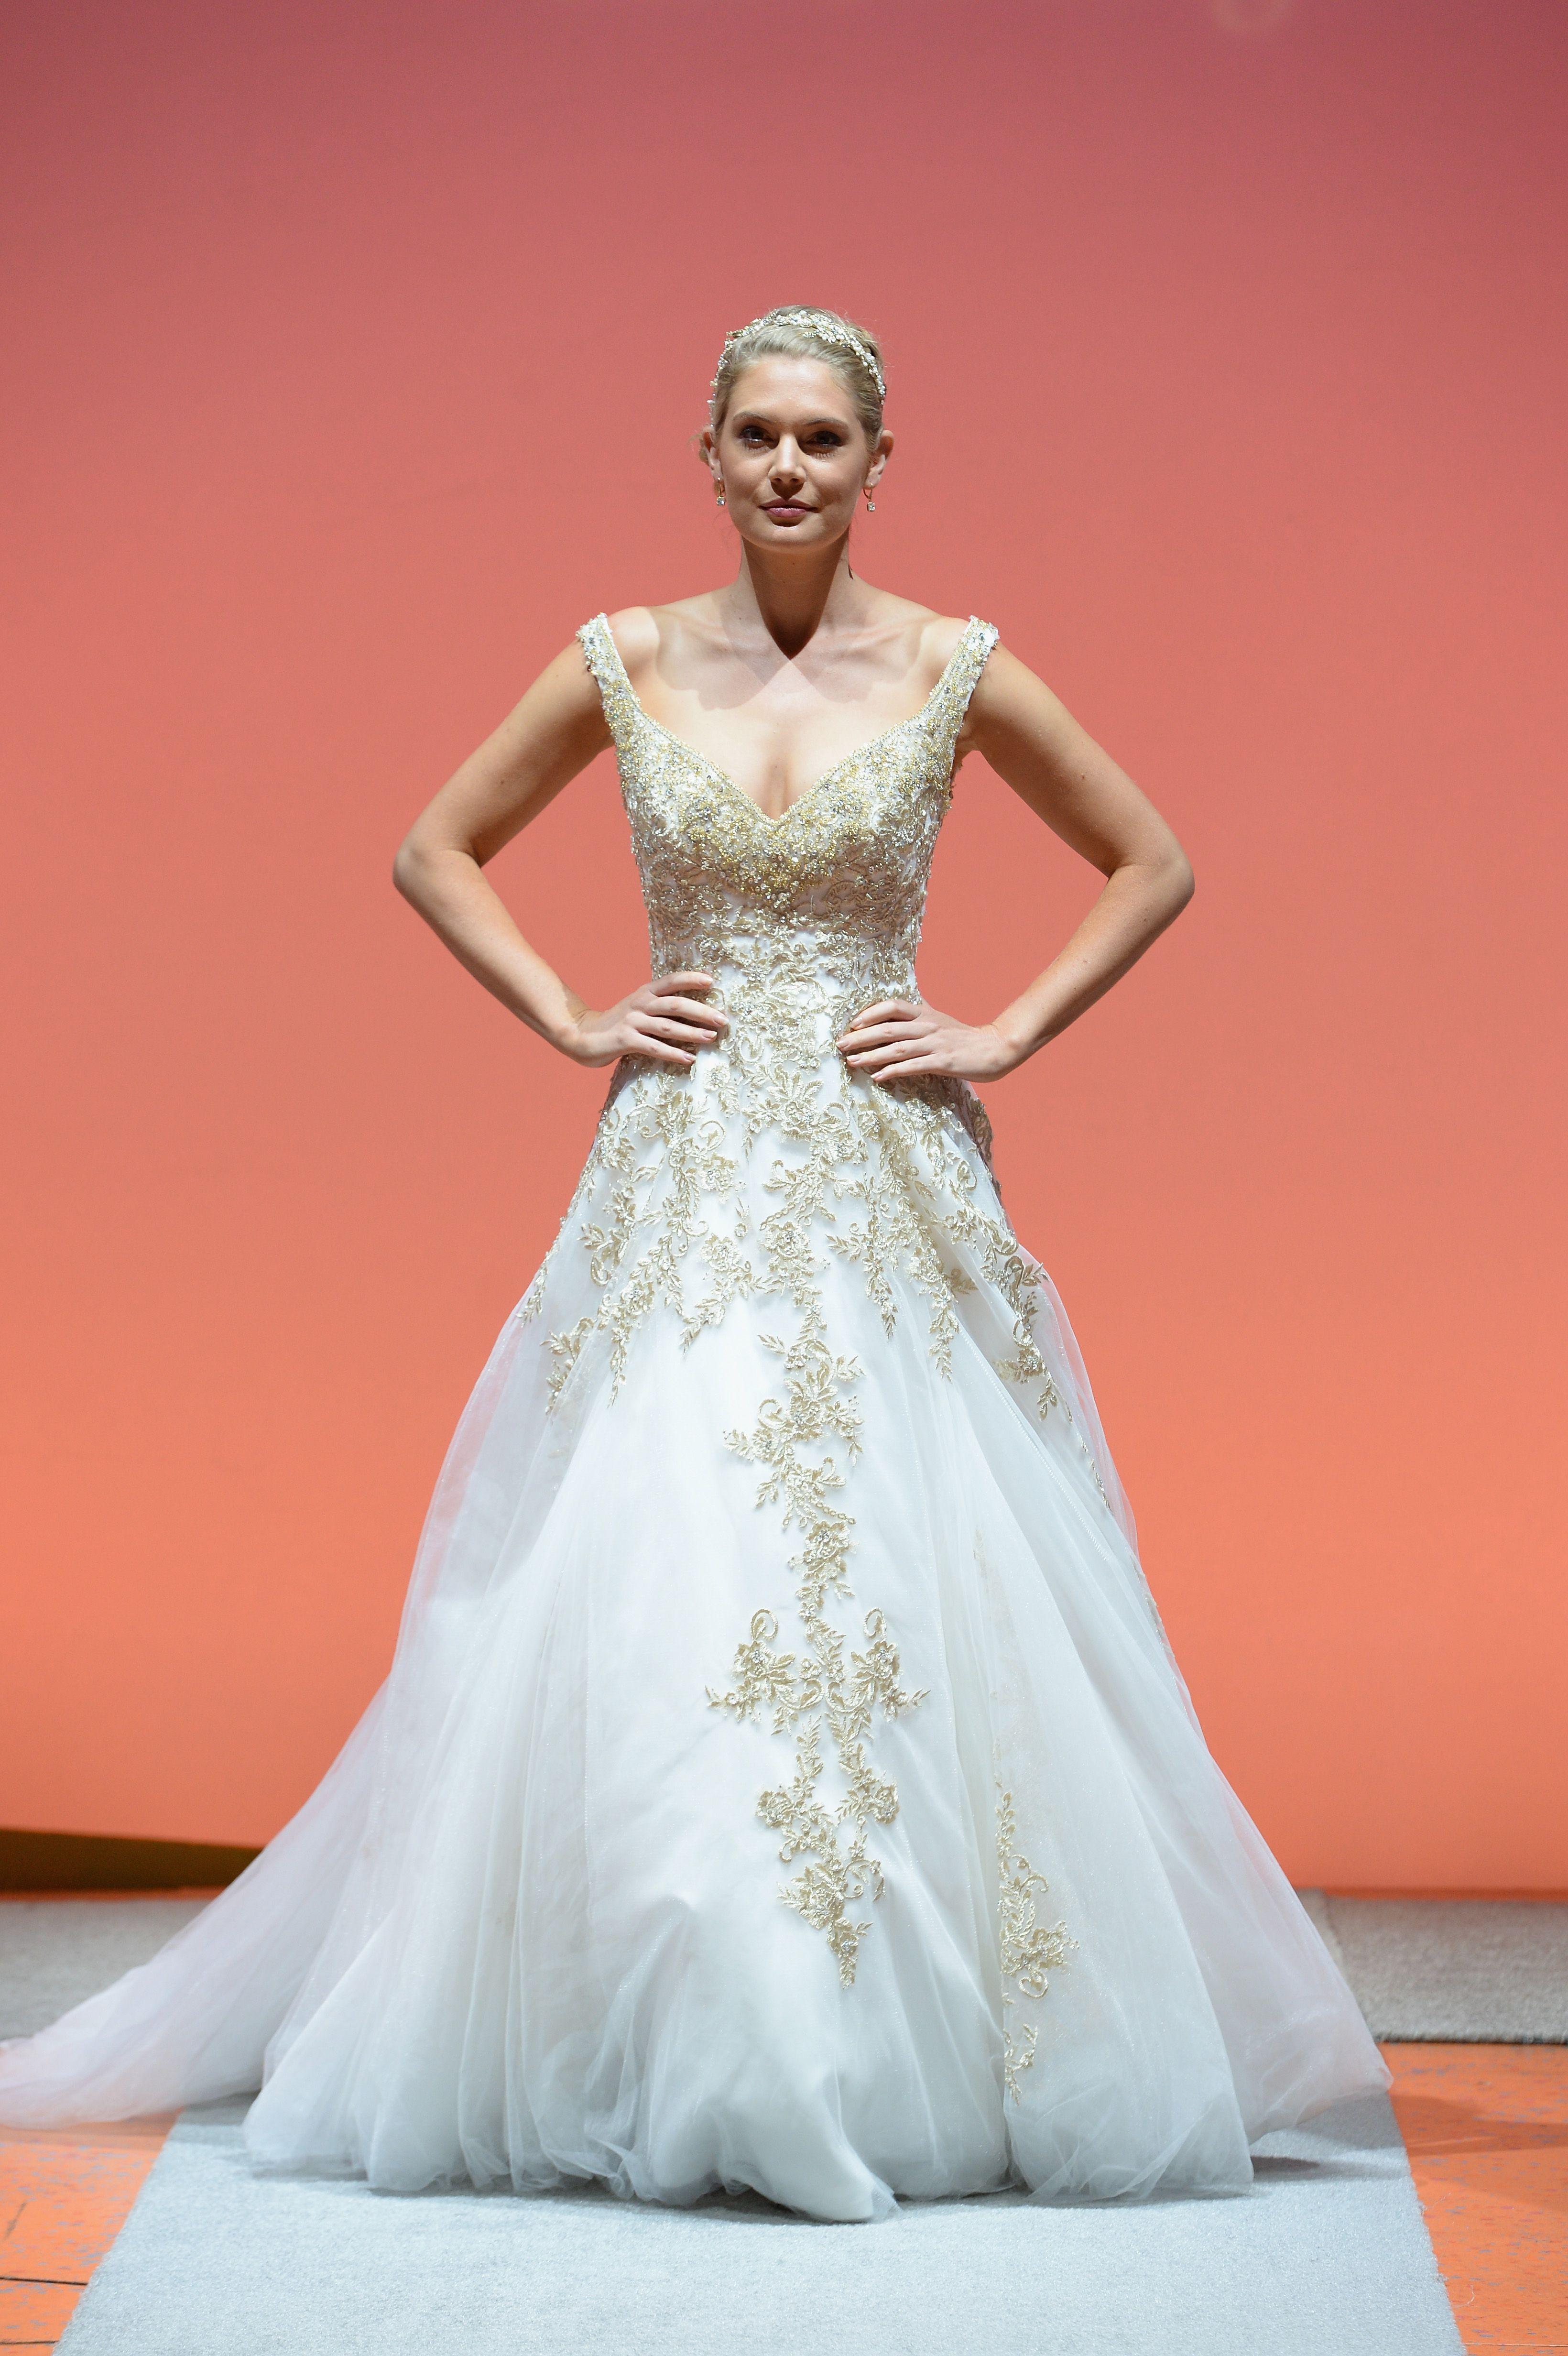 2016 Disney Fairy Tale Weddings By Alfred Angelo Rapunzel Disney Wedding Dresses Disney Princess Wedding Dresses Fall Wedding Dresses [ 4928 x 3280 Pixel ]